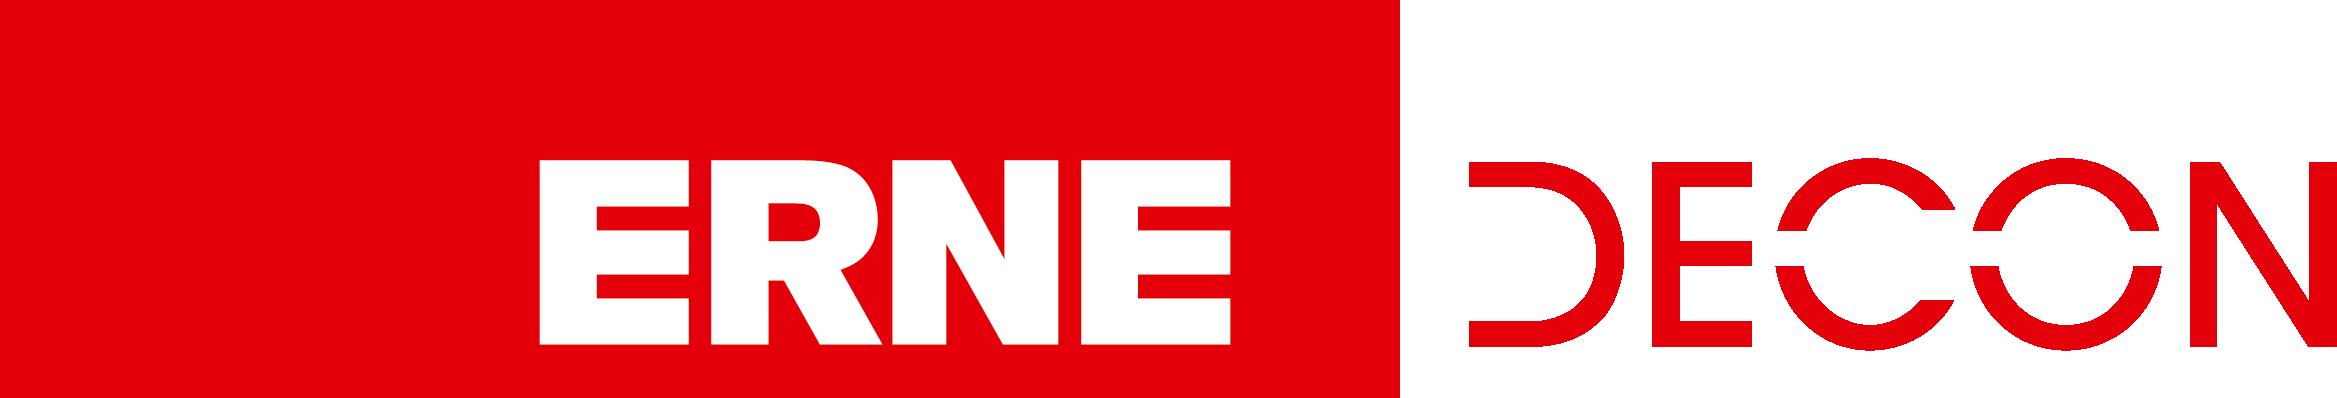 Logo ERNE decon AG